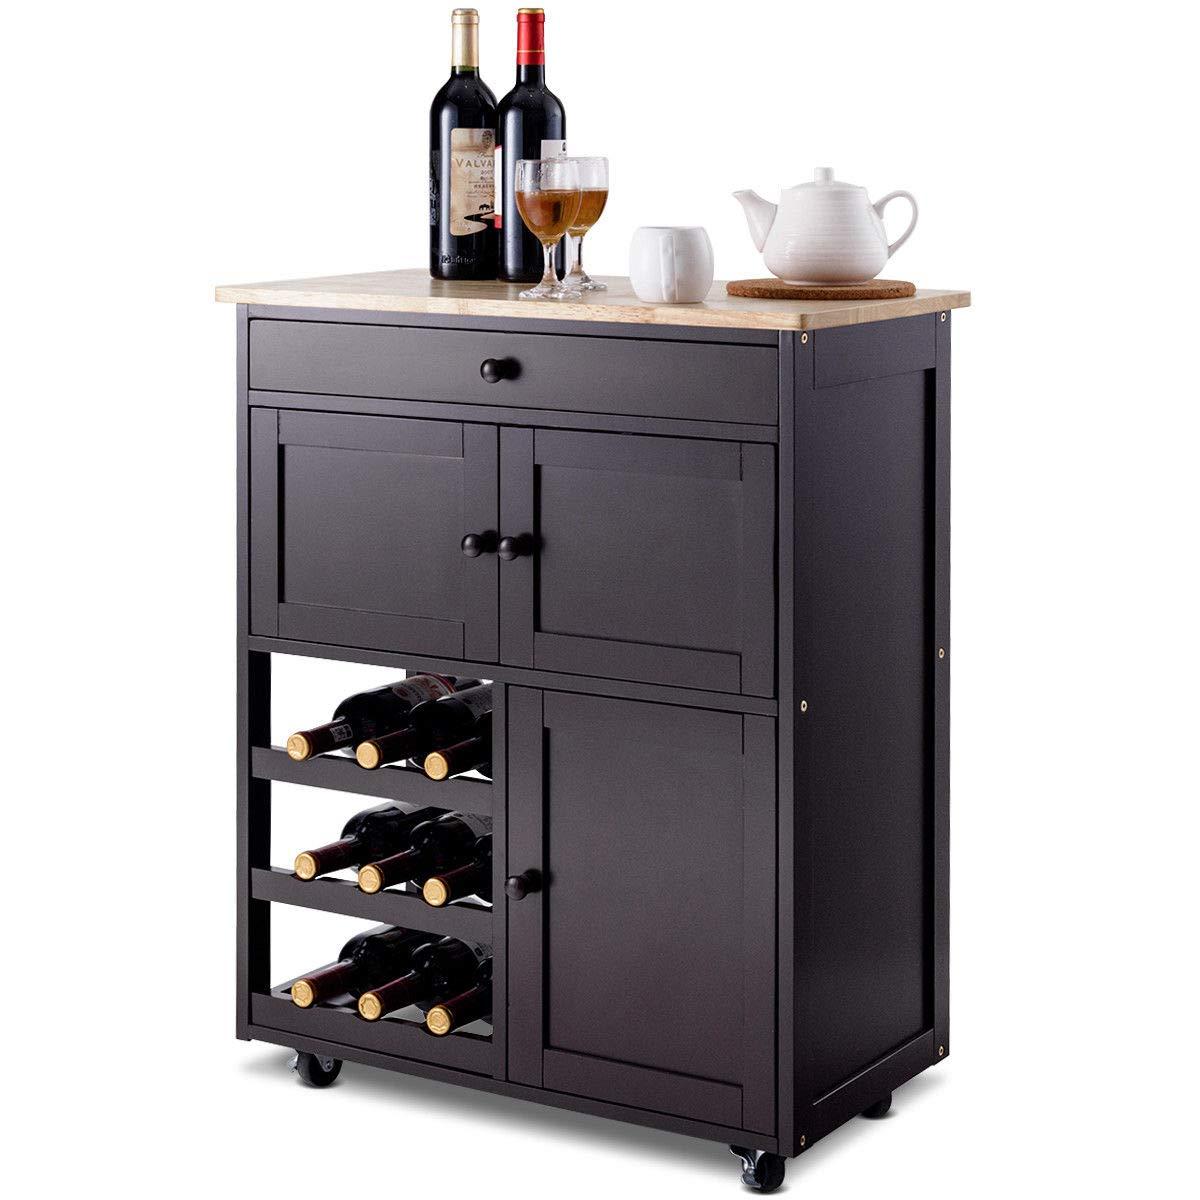 Giantex Modern Rolling Kitchen Trolley Cart w/Drawer & Wine Rack Storage Cabinet Home Restaurant Island Serving Cart w/Wheels (Brown) HW56608BN